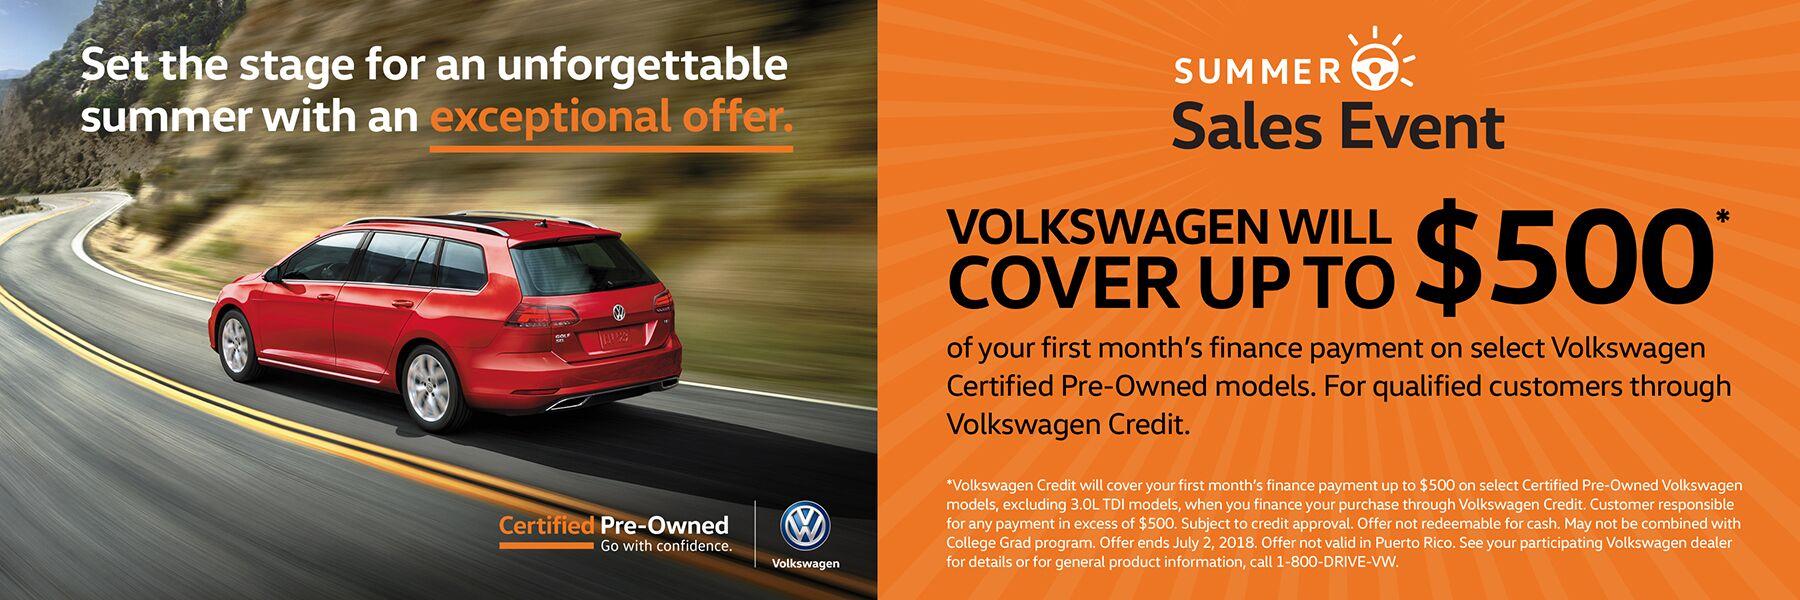 Volkswagen Certified Pre-Owned in Pompano Beach, FL